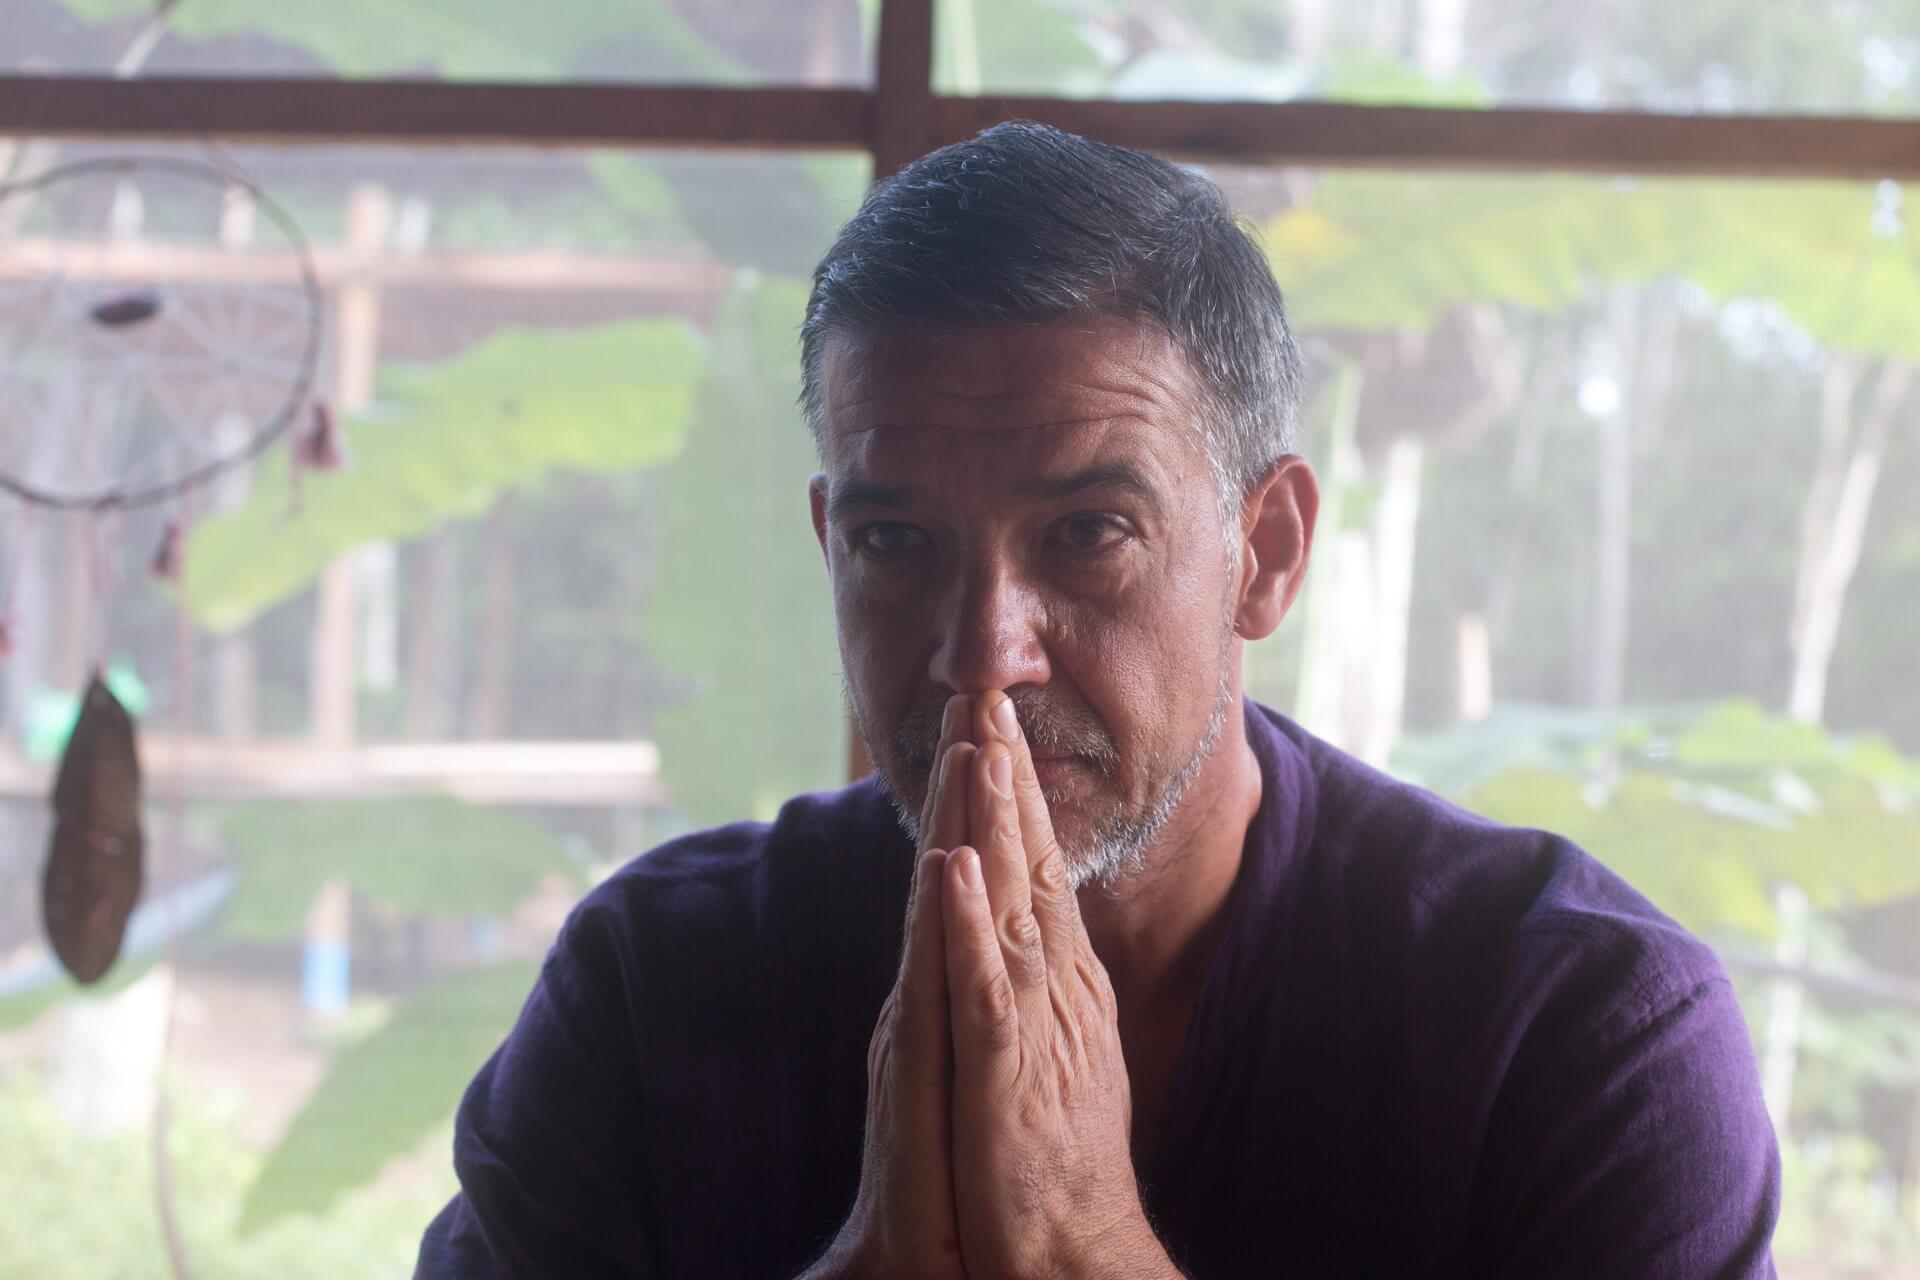 nik from germany participant at ayahuasca retreat in psychonauta foundation